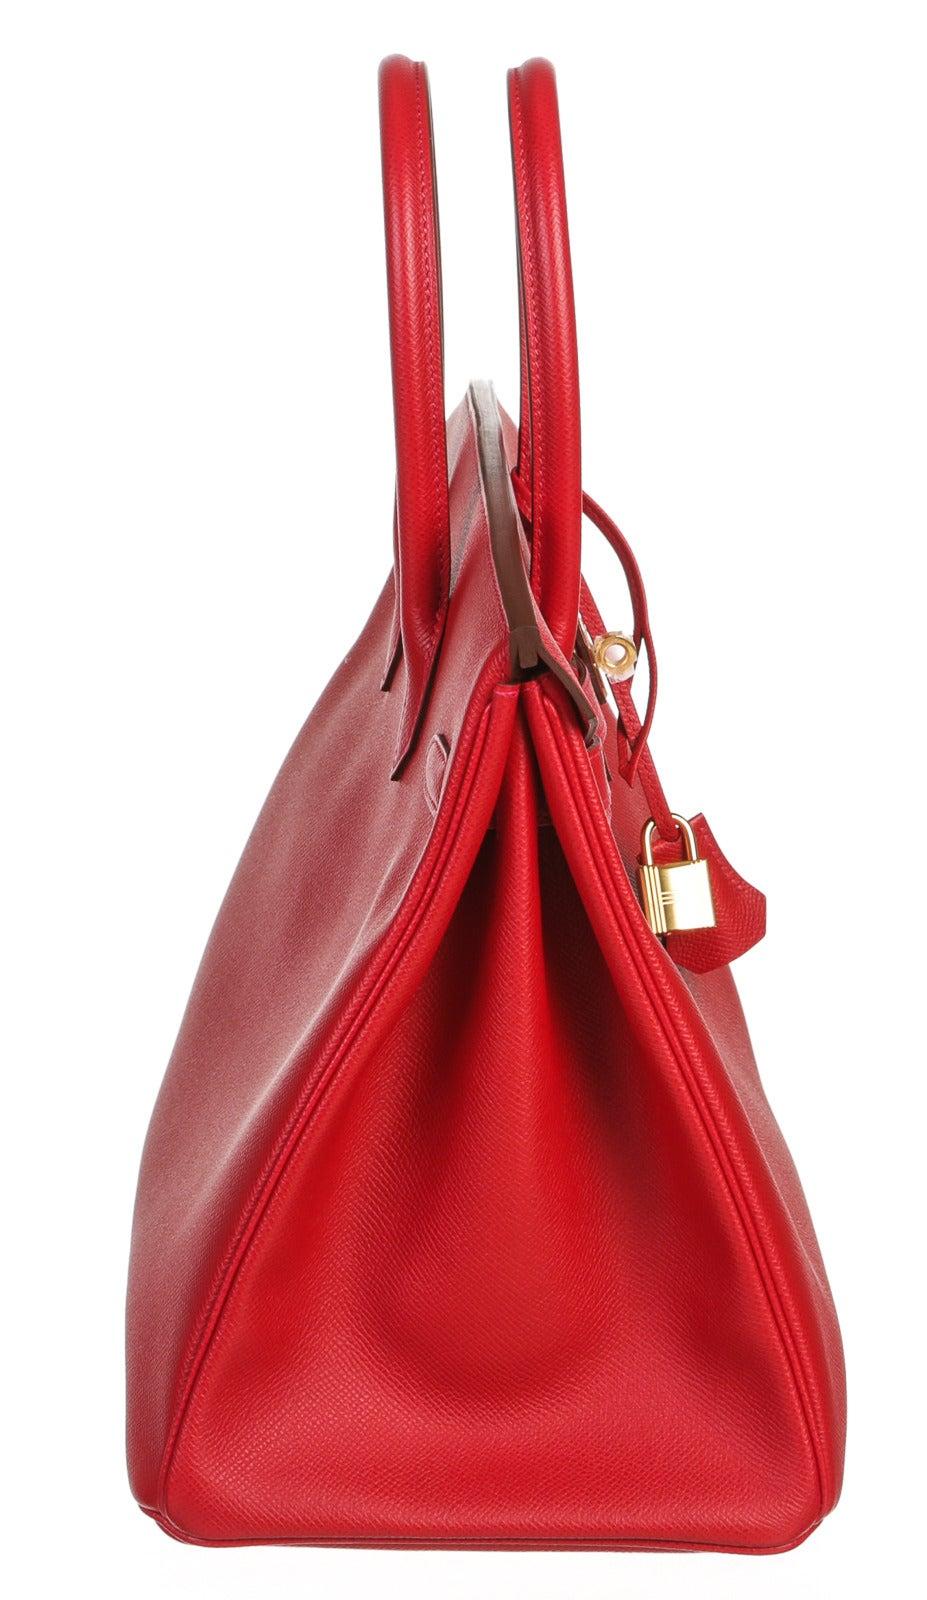 Hermes Red Epsom Leather 35cm Birkin Handbag GHW at 1stdibs